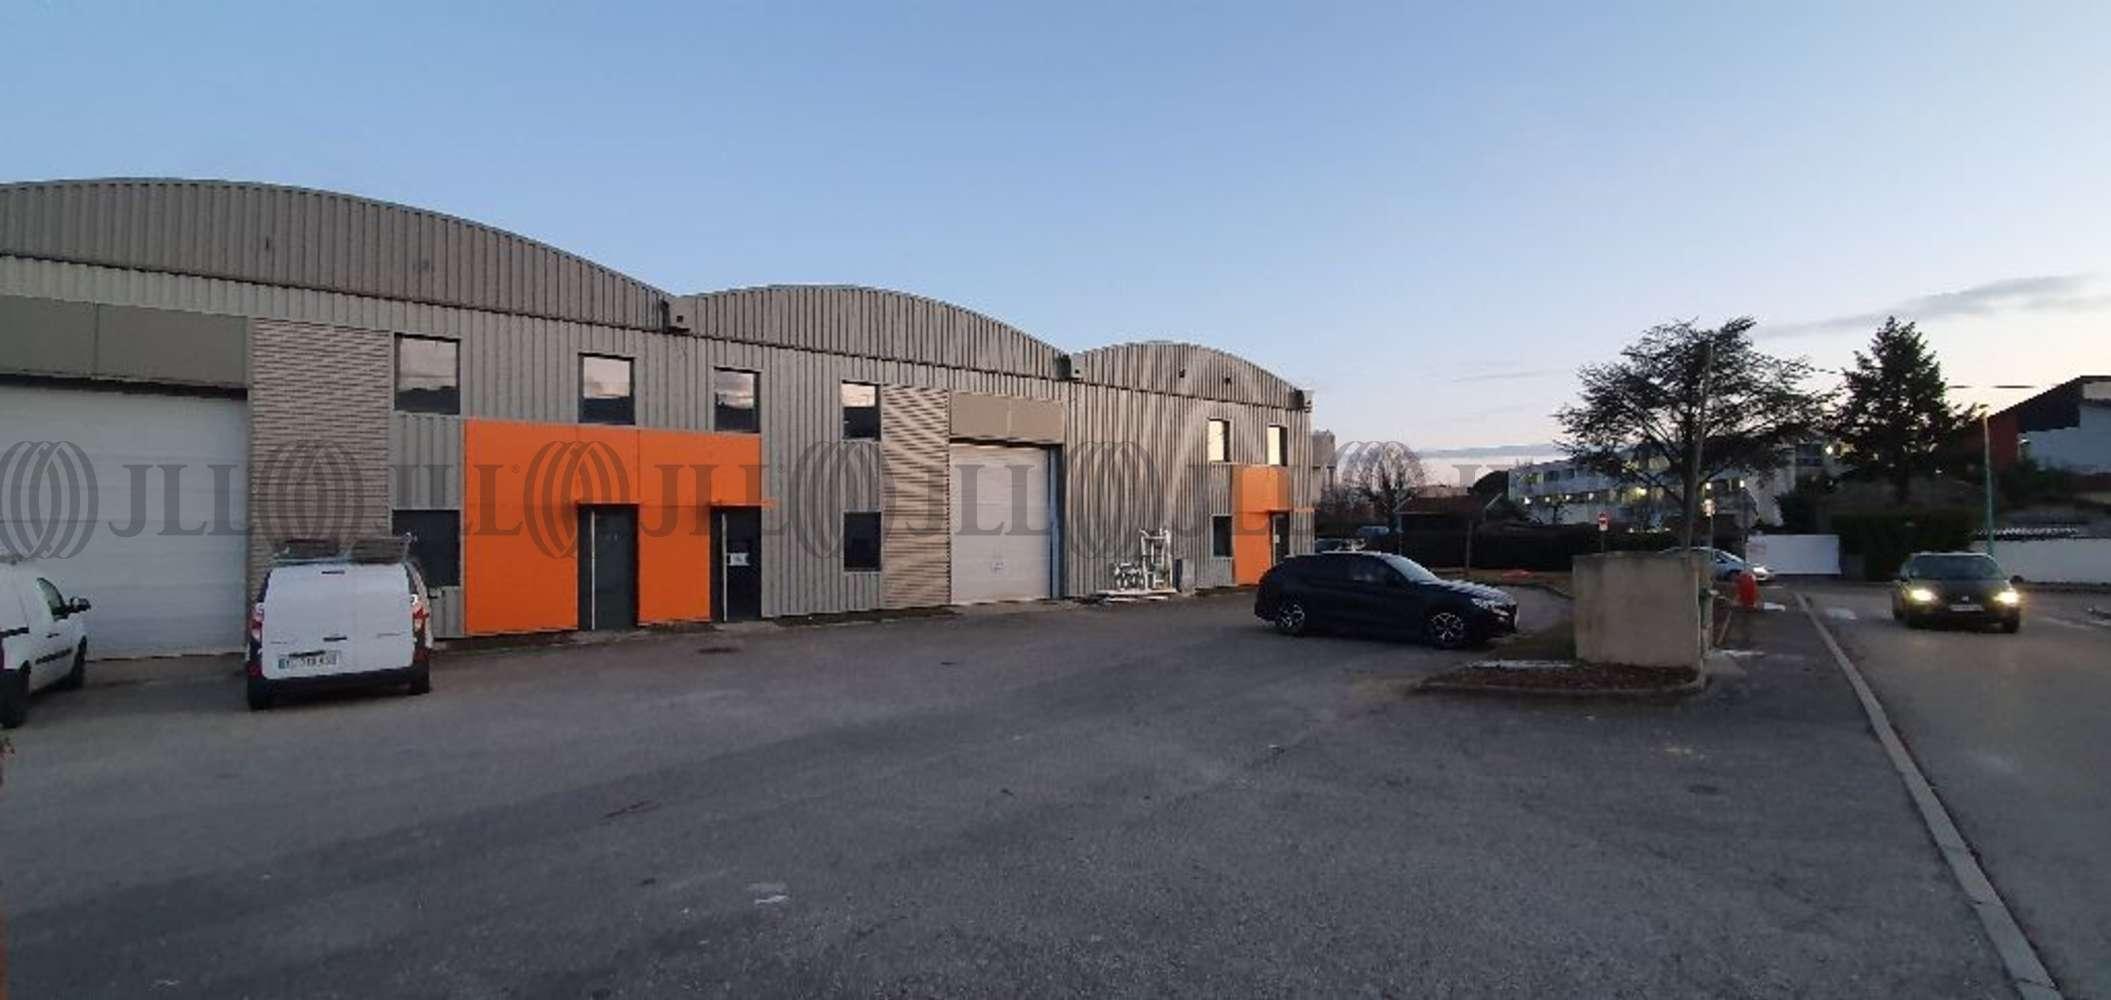 Activités/entrepôt Dardilly, 69570 - Location locaux d'activité Dardilly Lyon - 10921713